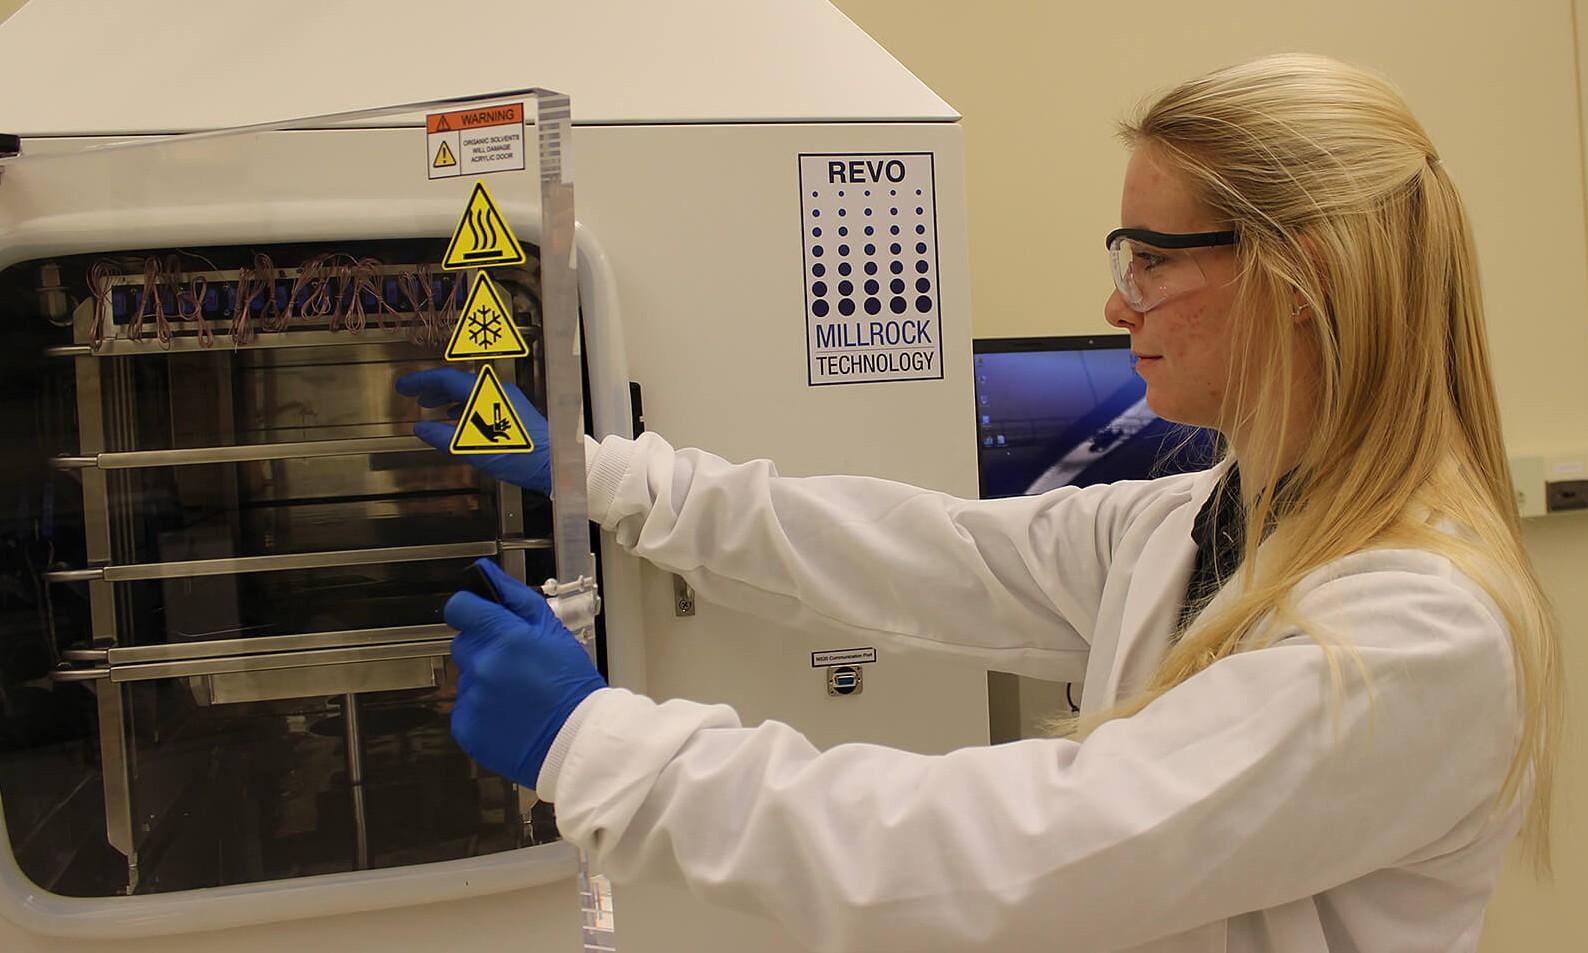 LyoHub to transform freeze-drying process to make lifesaving drugs, preserve food photo